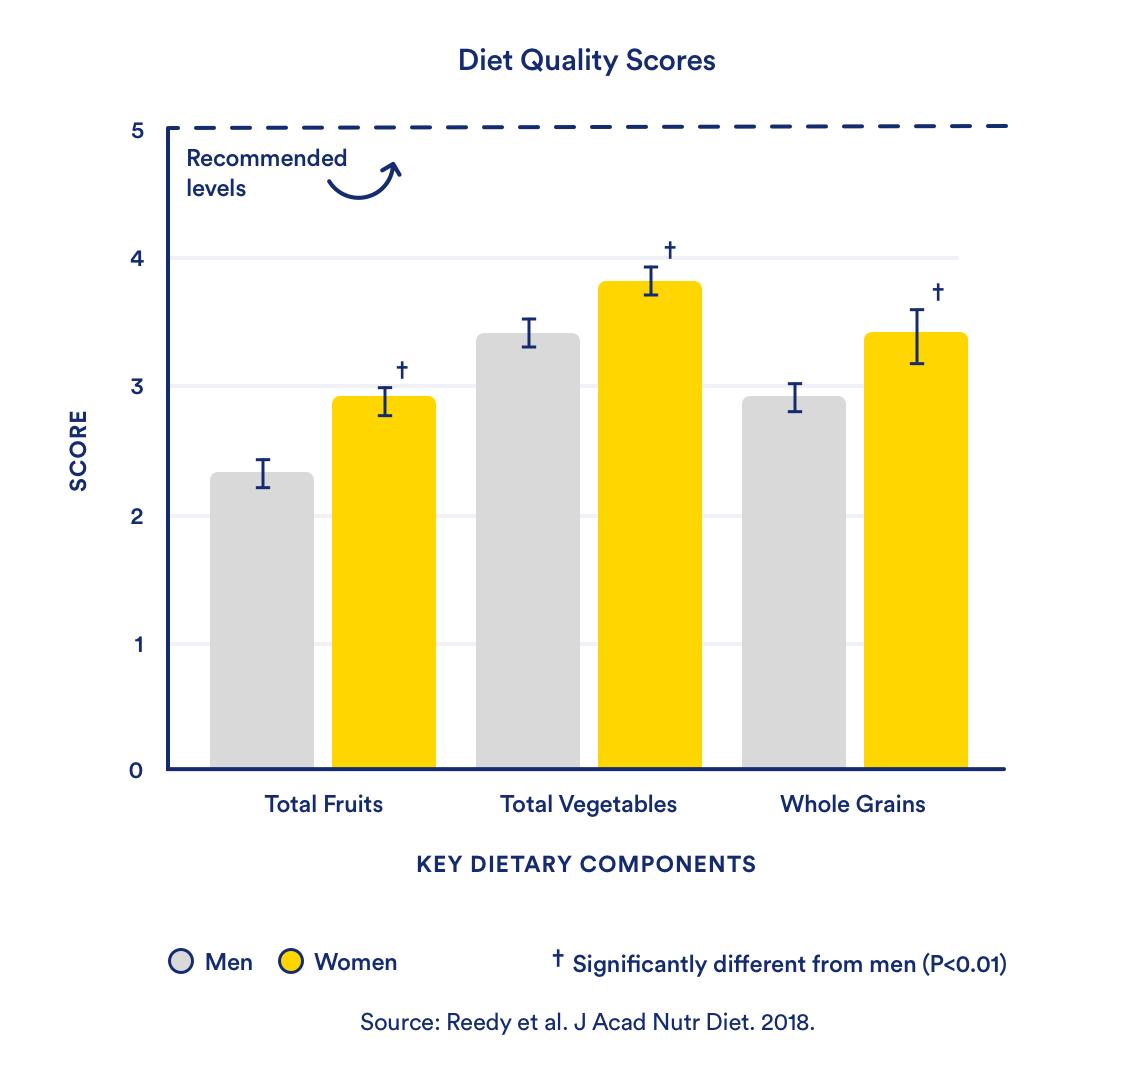 Diet Quality Scores